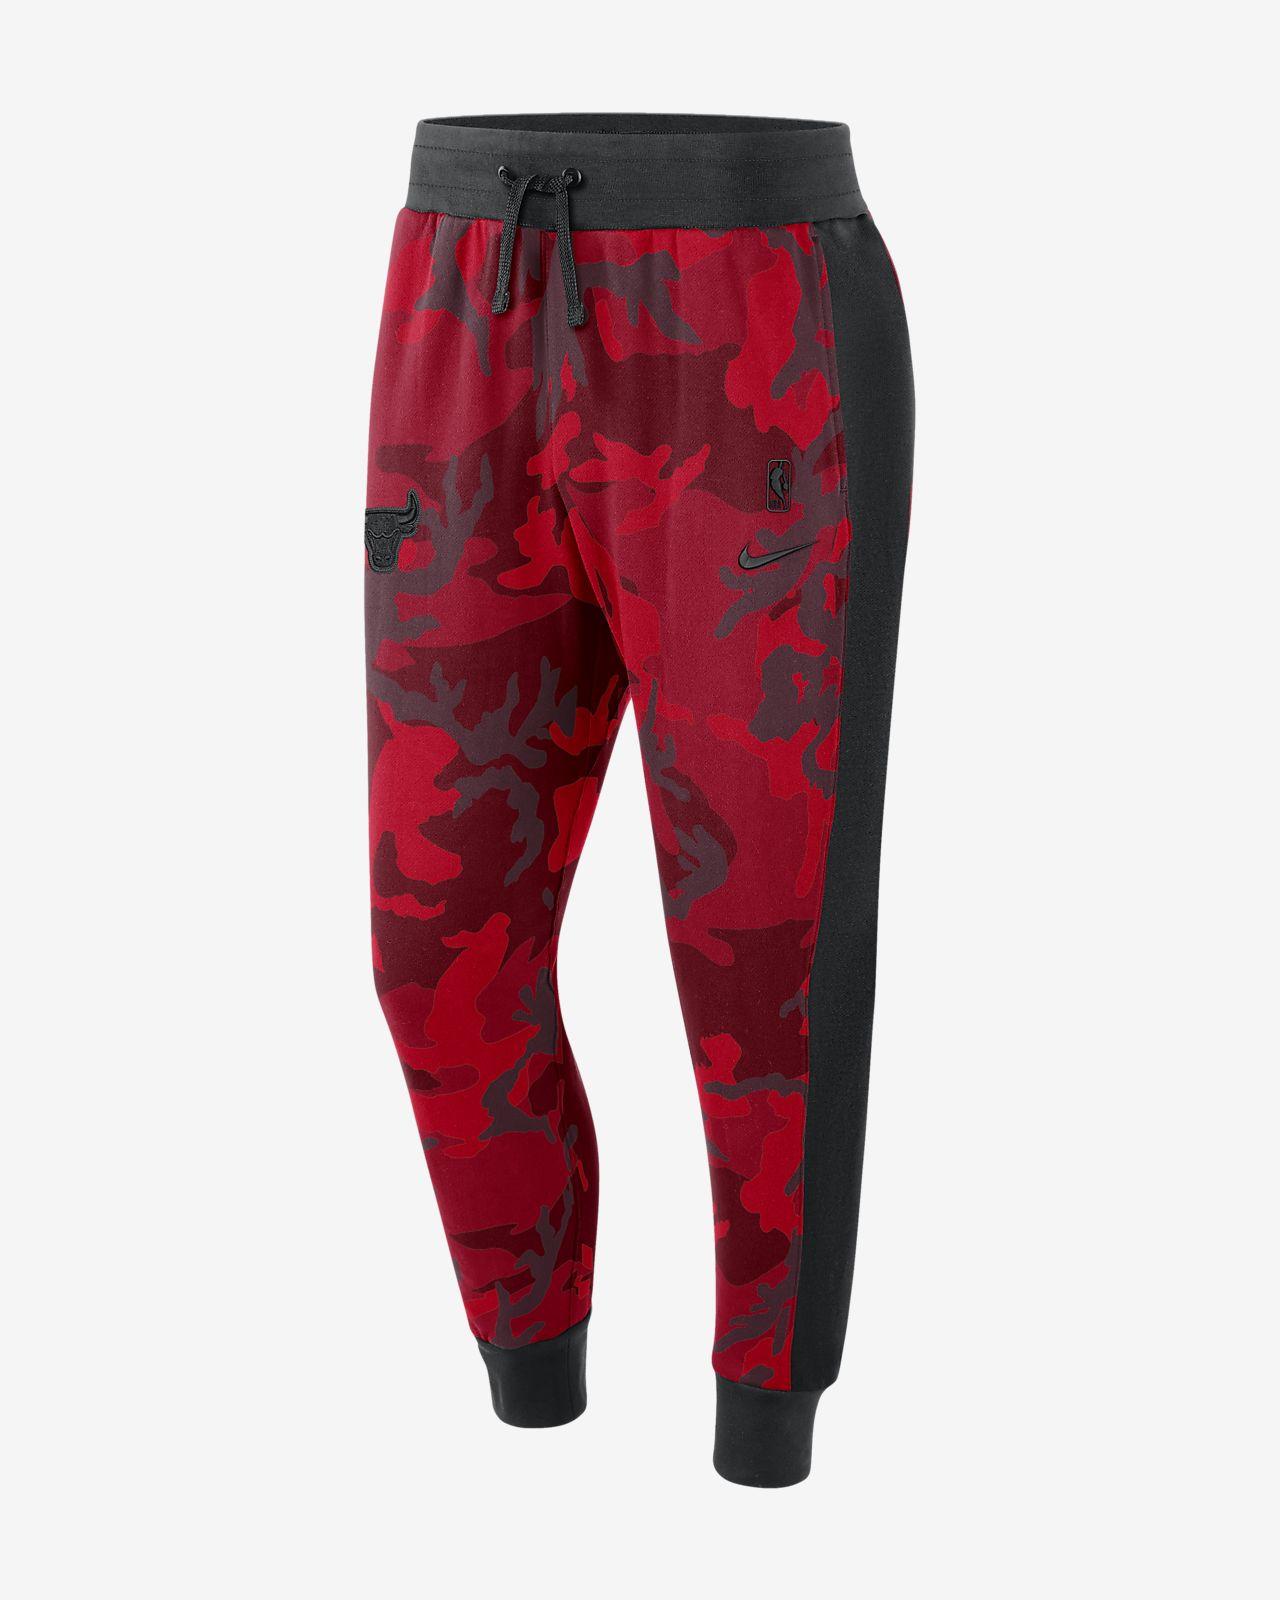 Pánské kalhoty NBA Chicago Bulls Nike